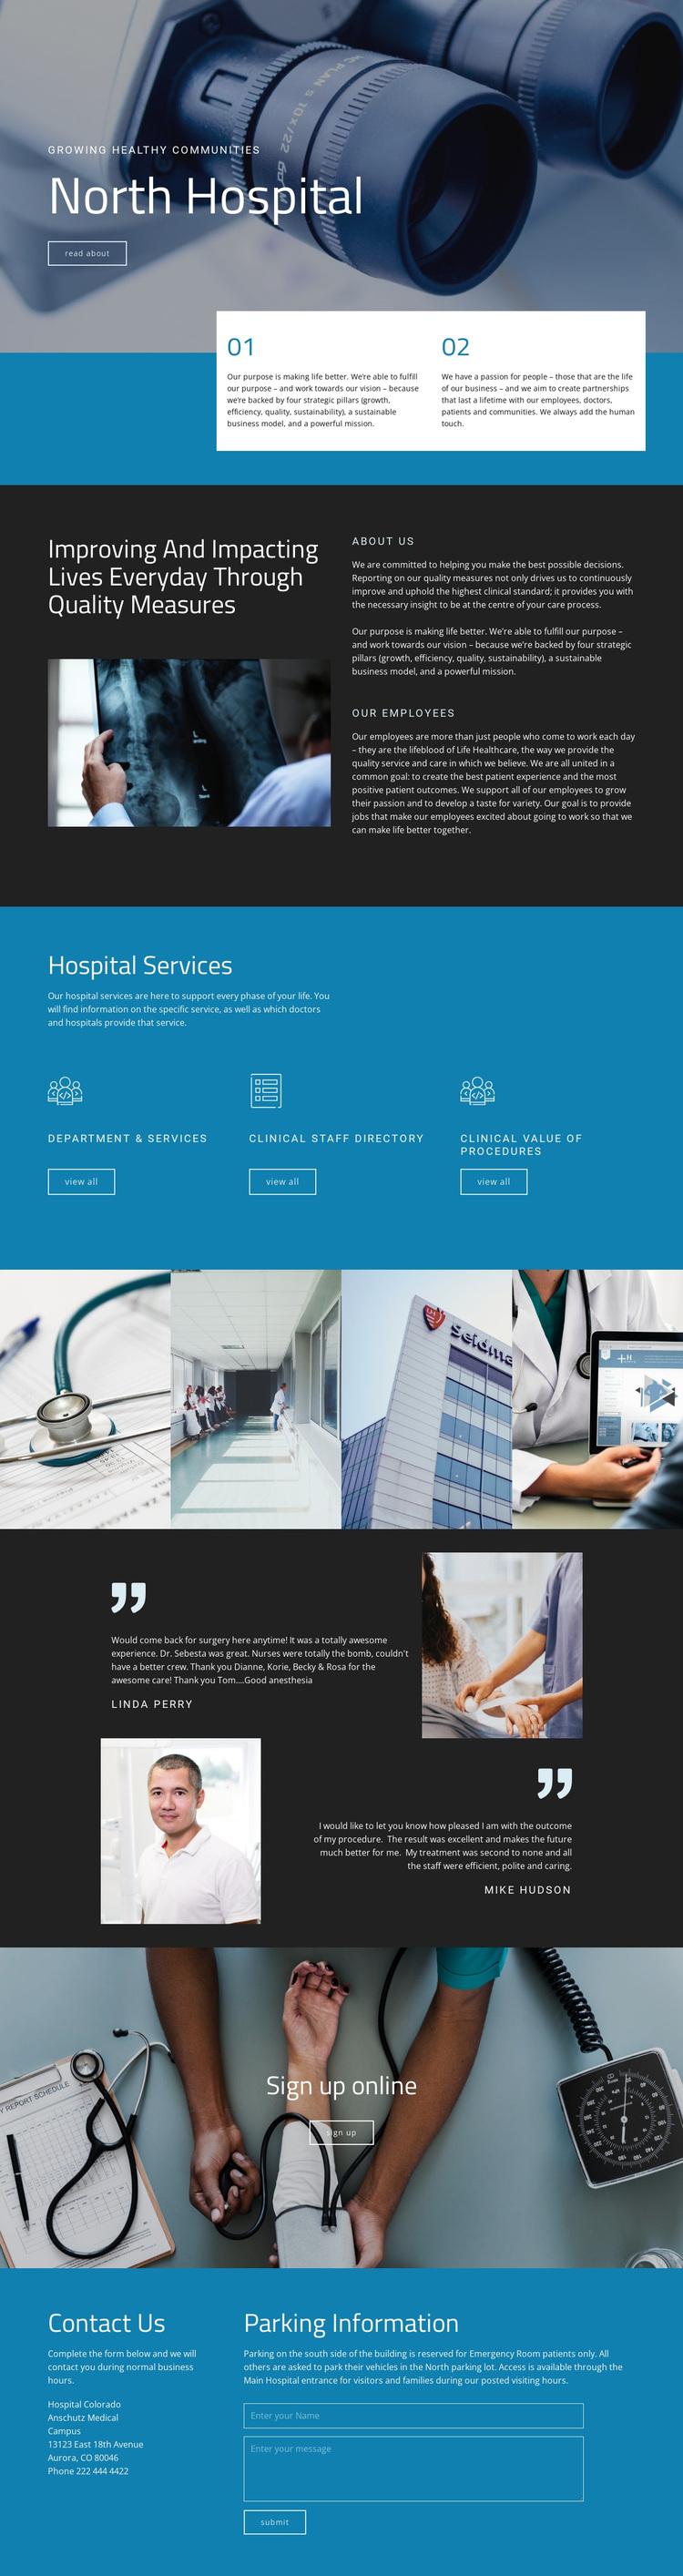 Impacting lives with medicine Joomla Page Builder